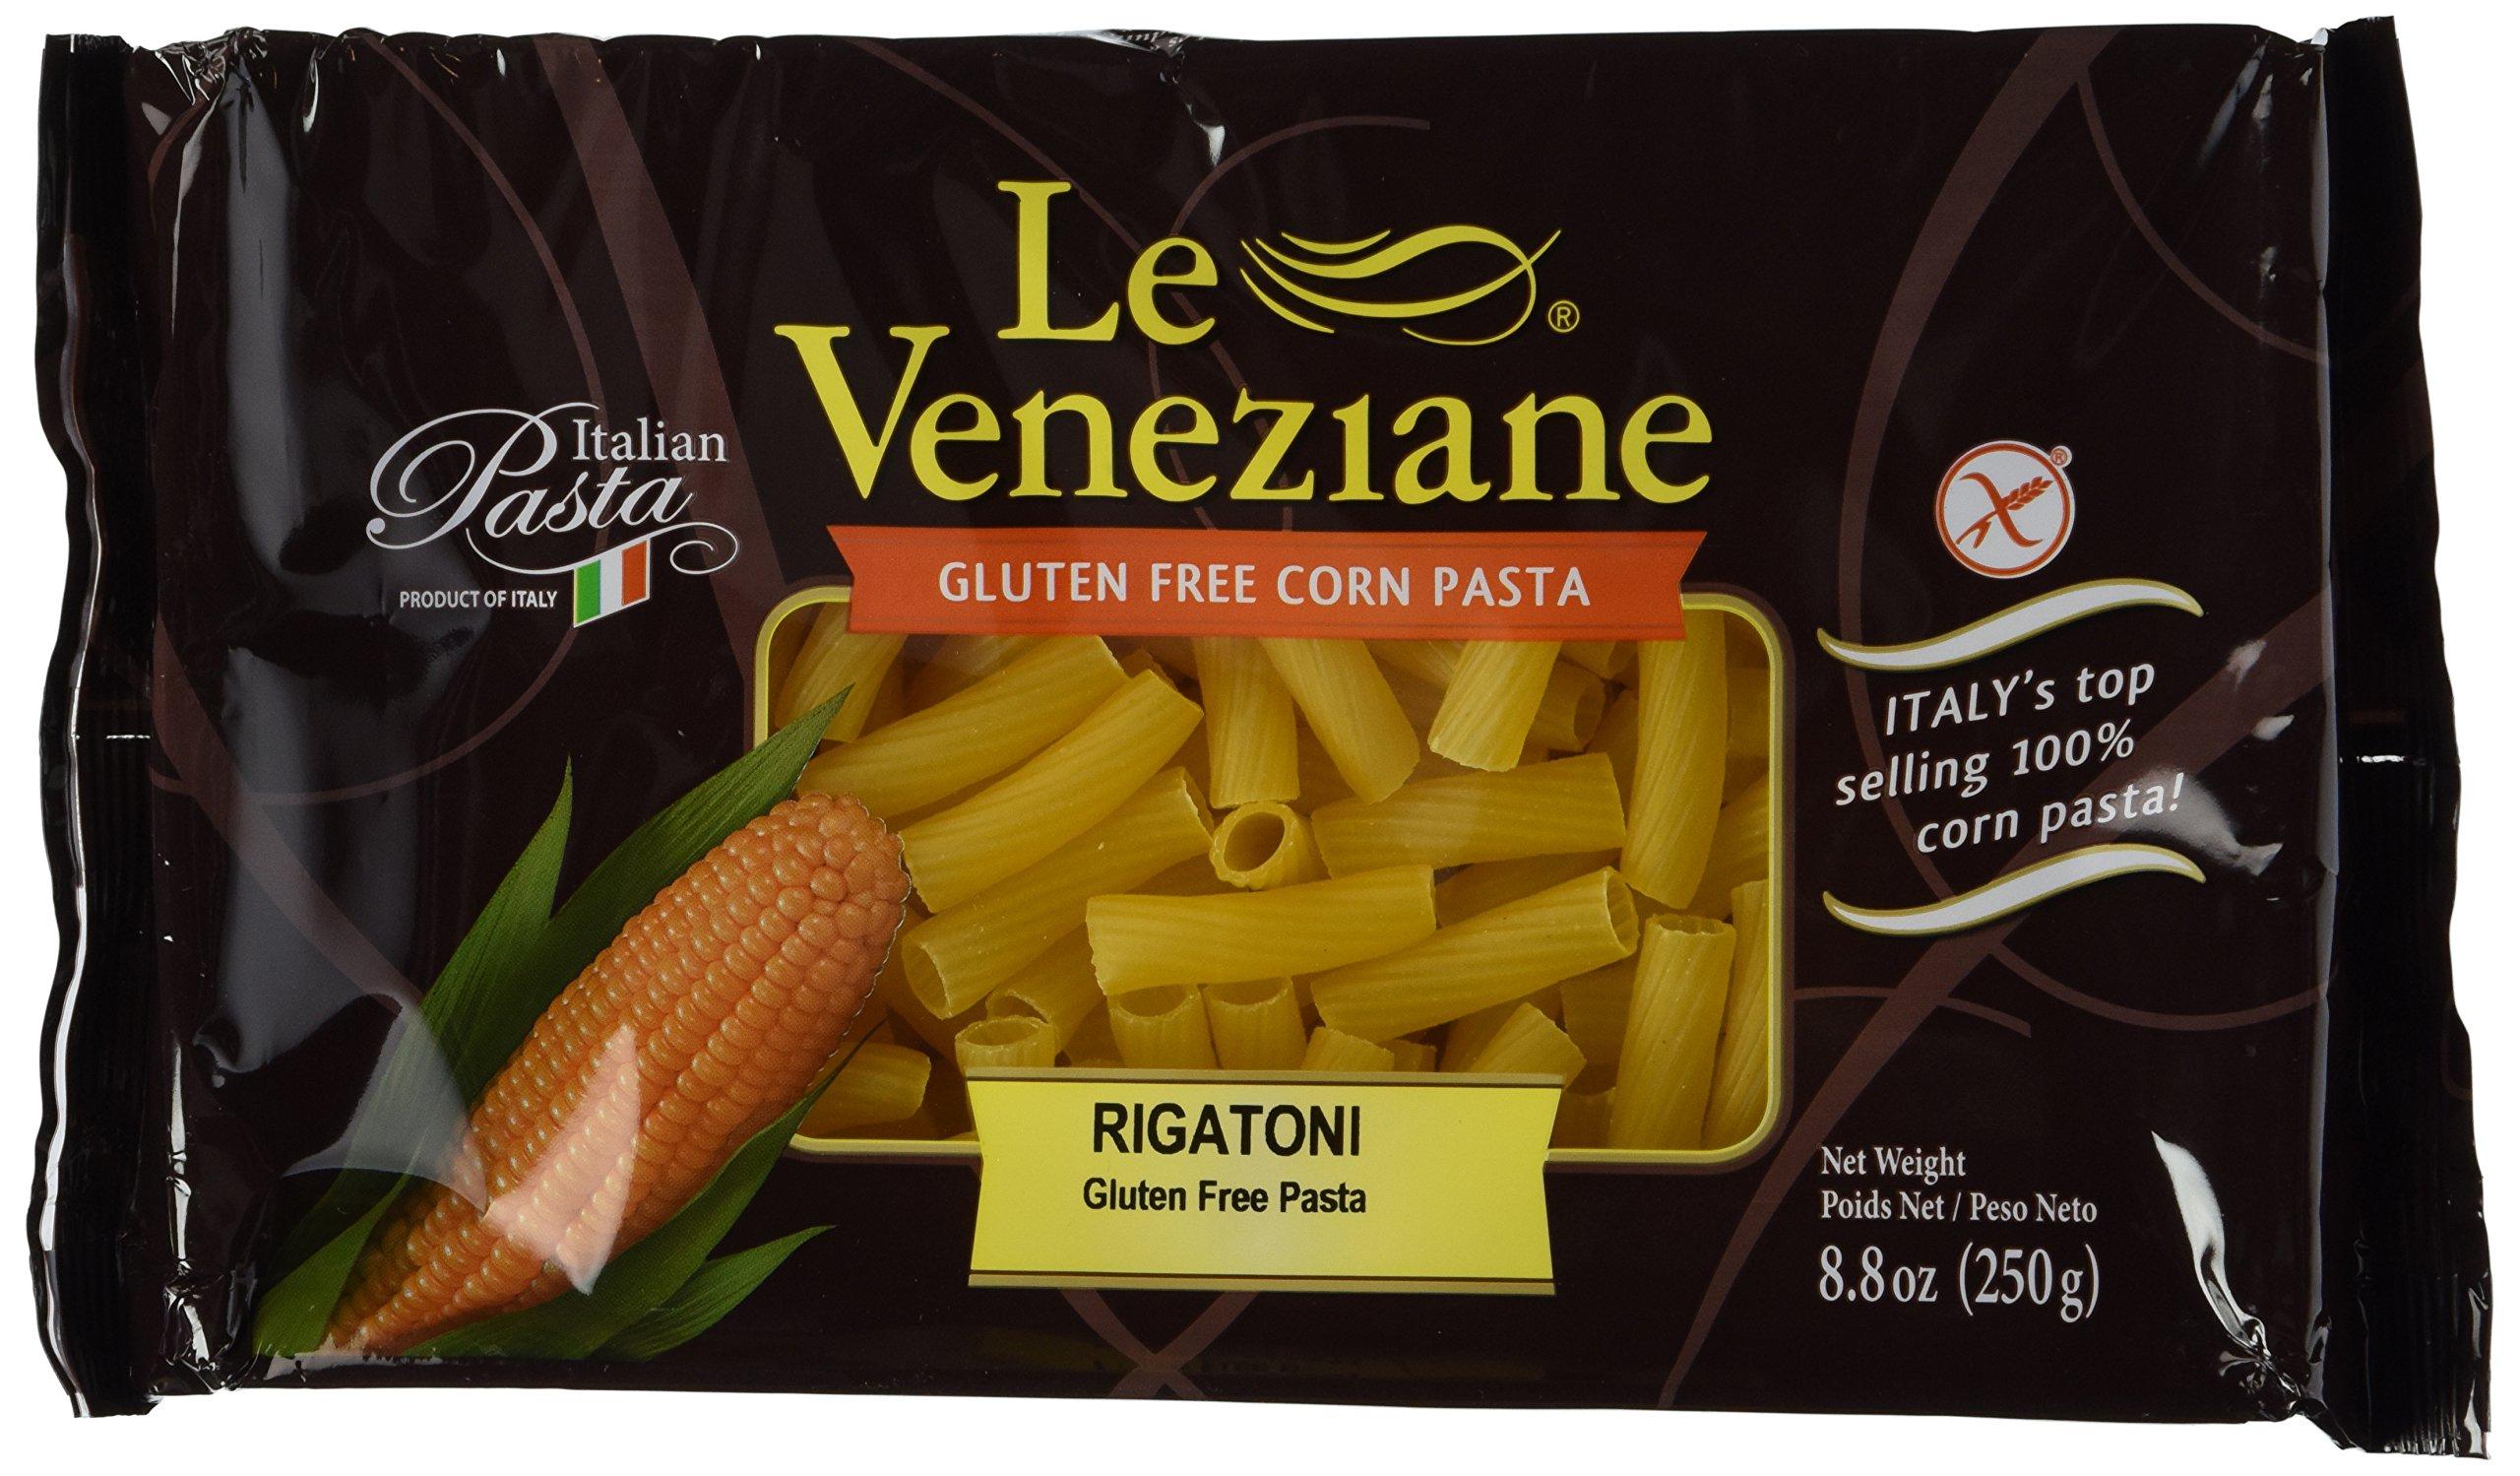 Le Veneziane - Italian Rigatoni Pasta [Gluten-Free], (4)- 8.8 oz. Pkgs by Le Veneziane